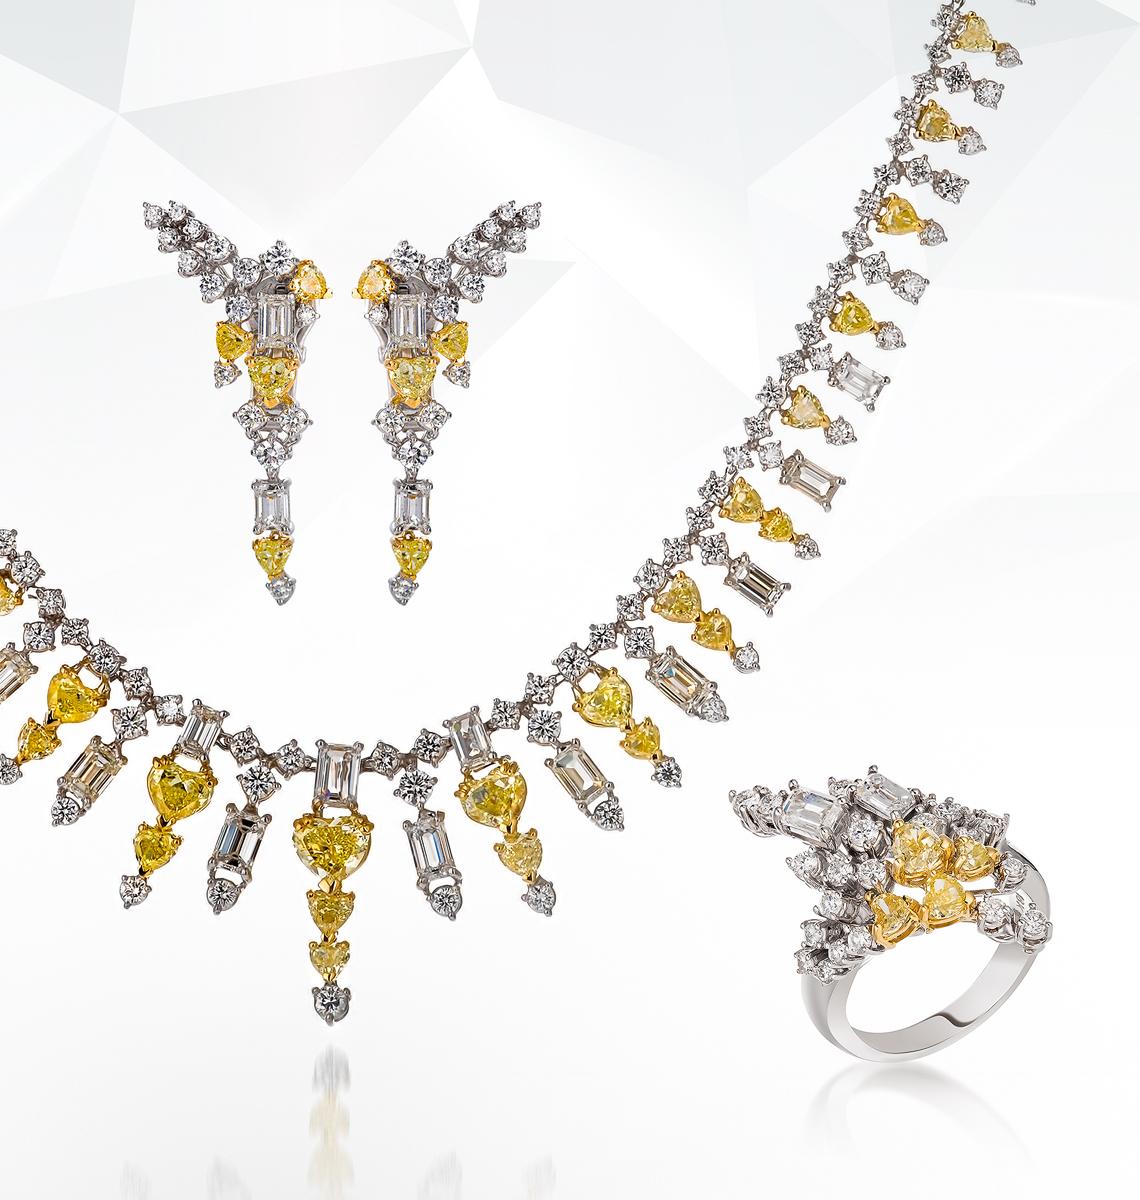 Clipart jewellers dubai location black and white Cara black and white